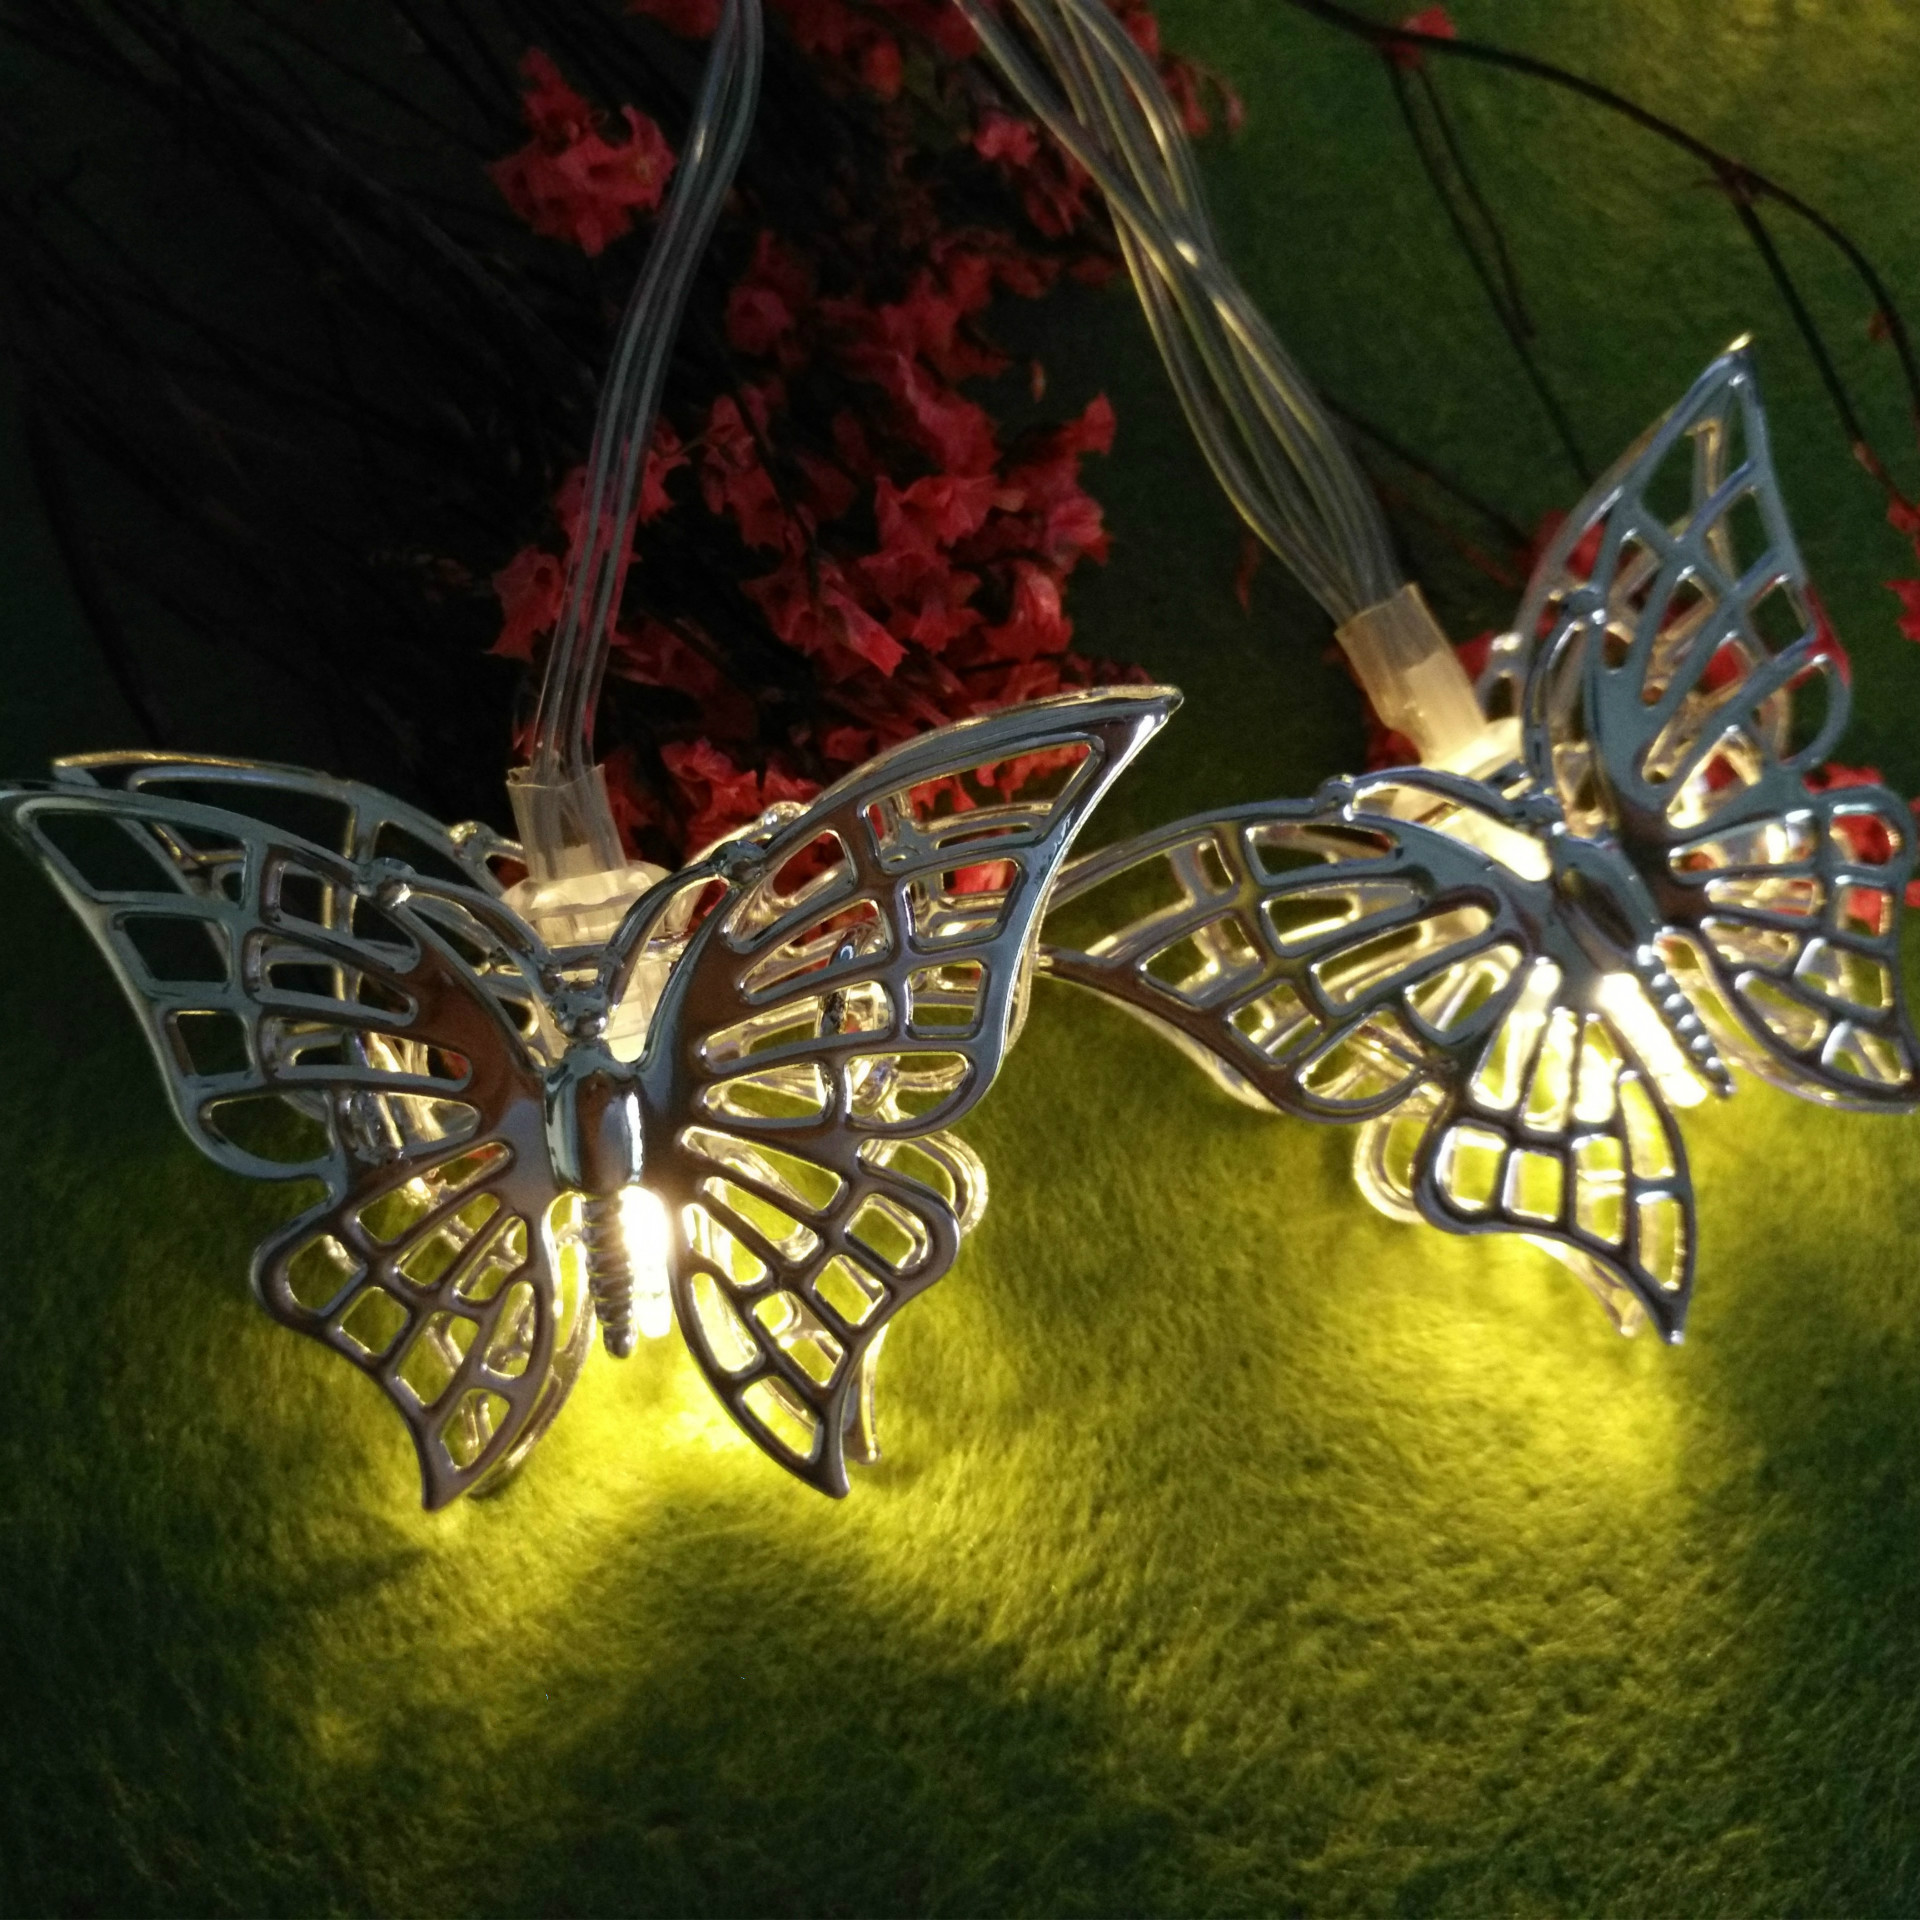 Faithful Butterfly Led String 10led/20led Battery Powered Girls Room Decoration Lighting Indoor Light Wall Decoration Lamp Iy310202 Lighting Strings